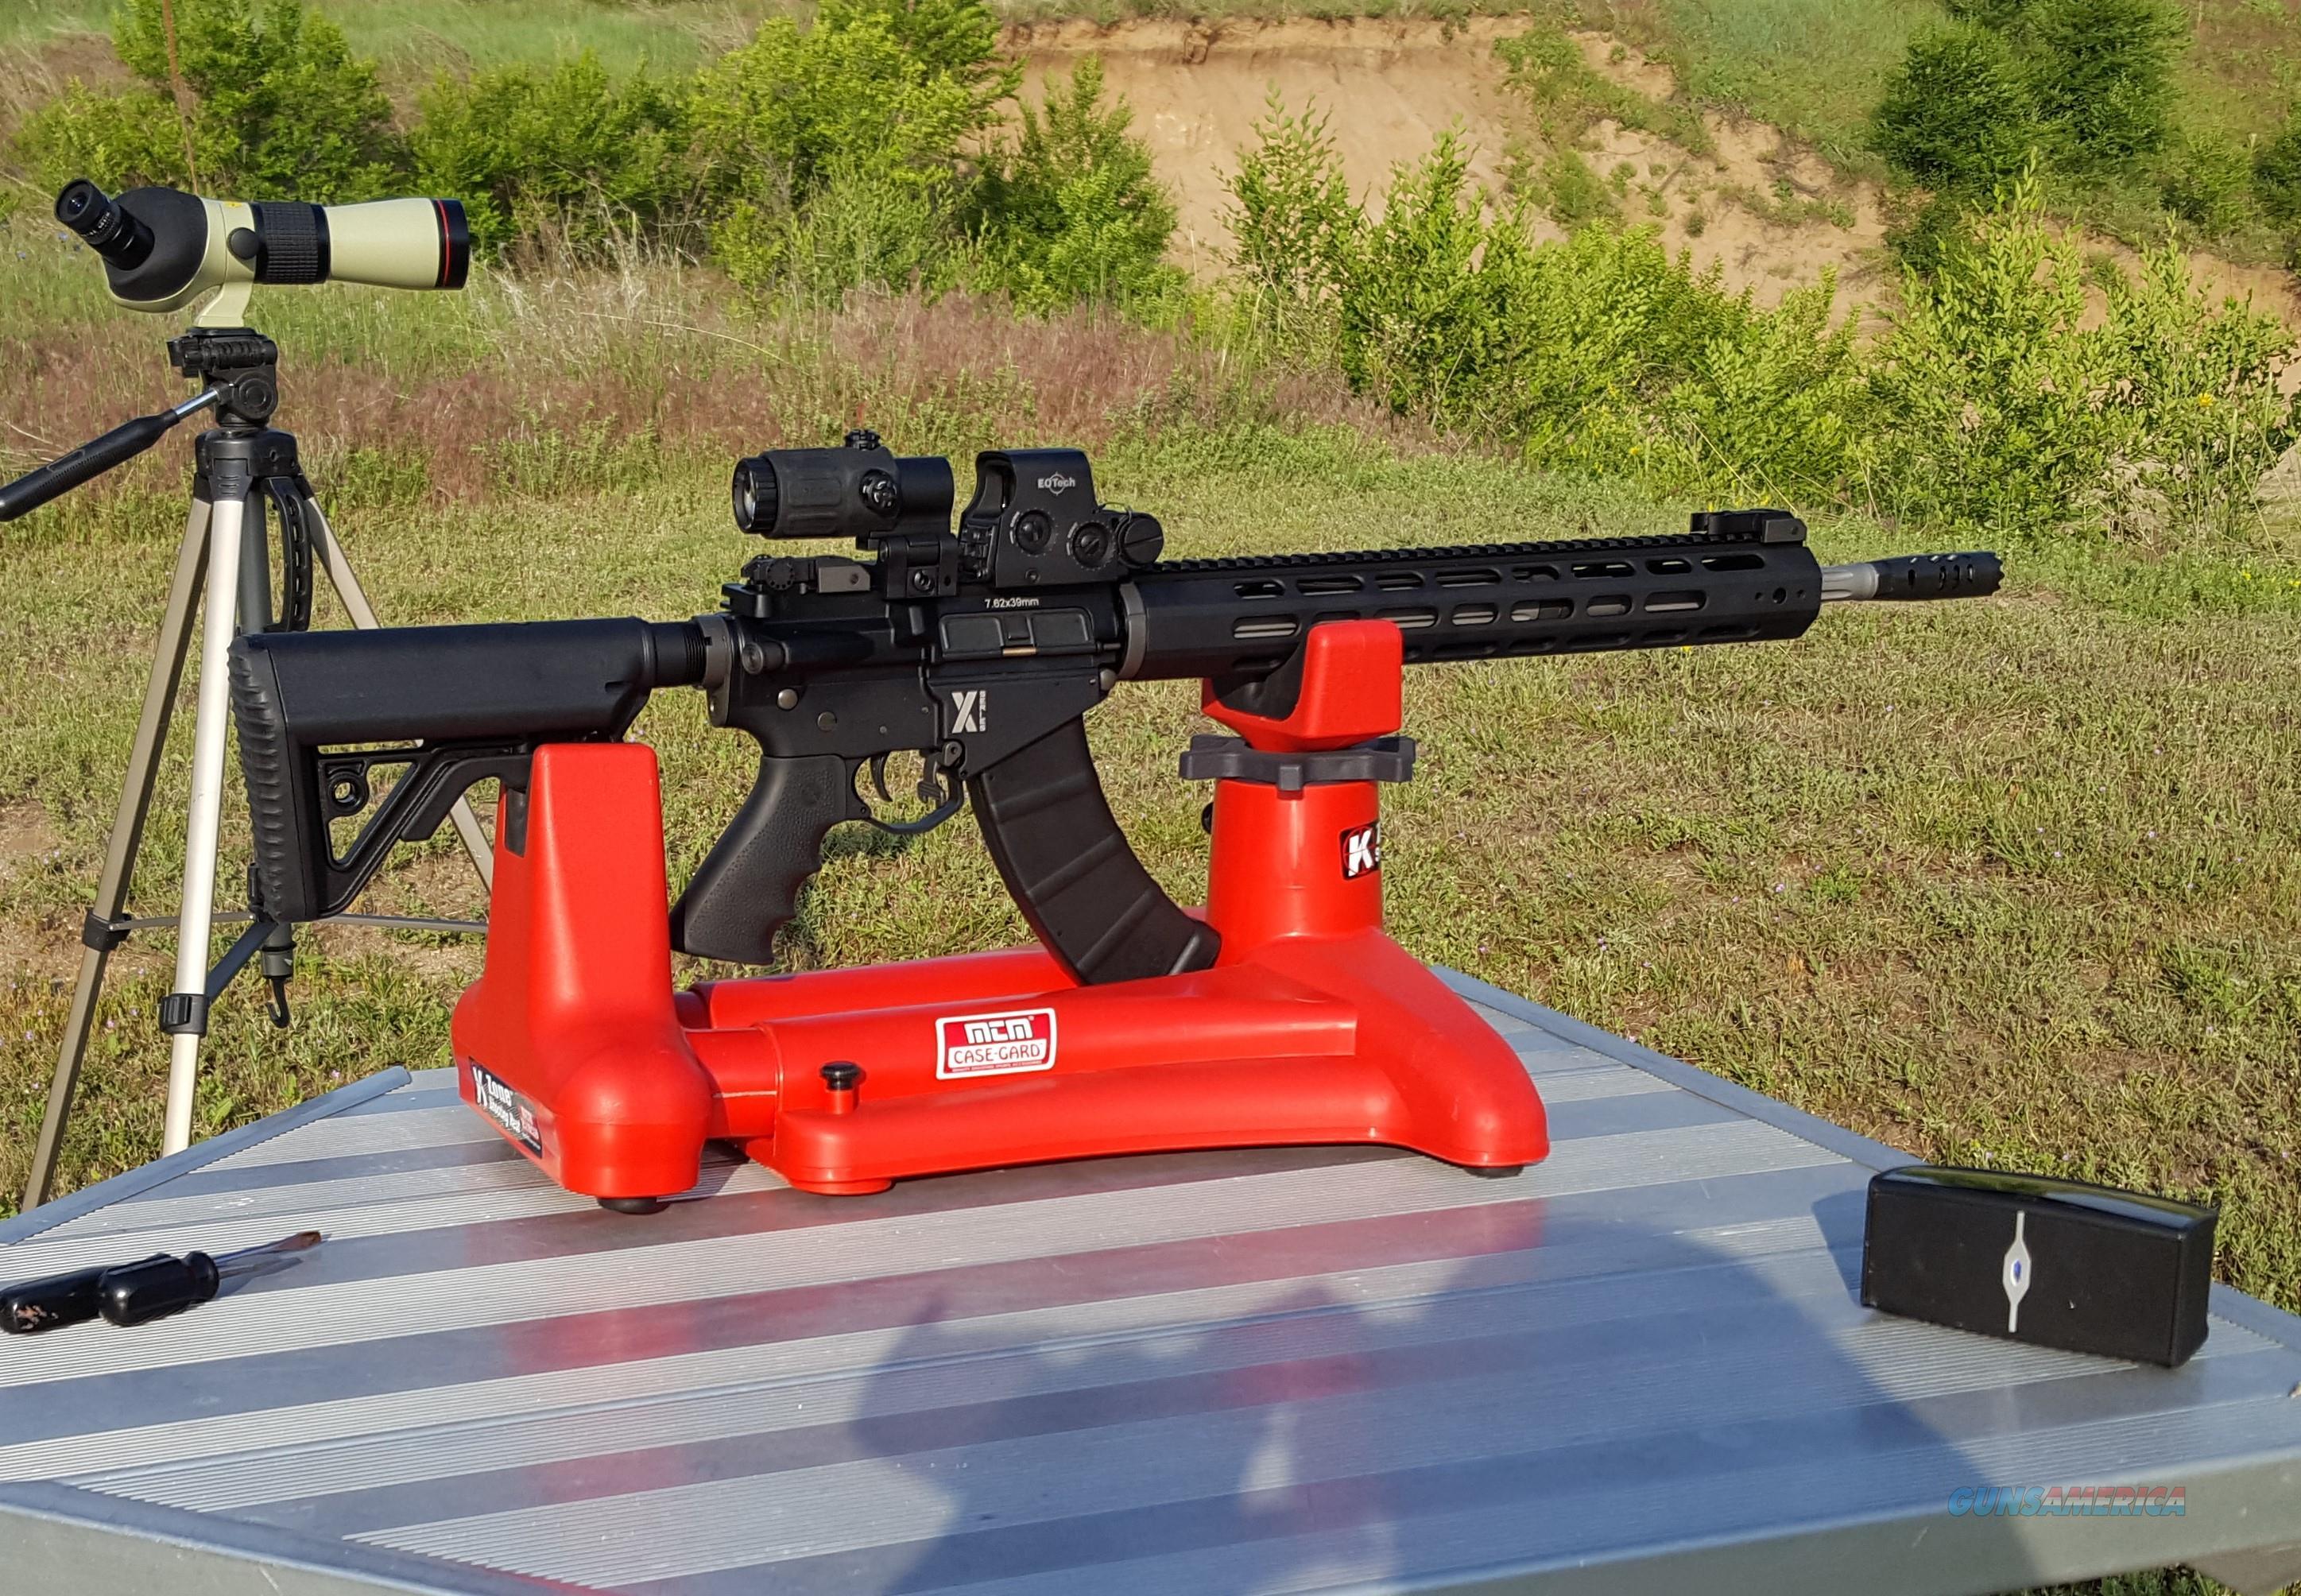 Rock River Arms LAR 47 - 7 62x39